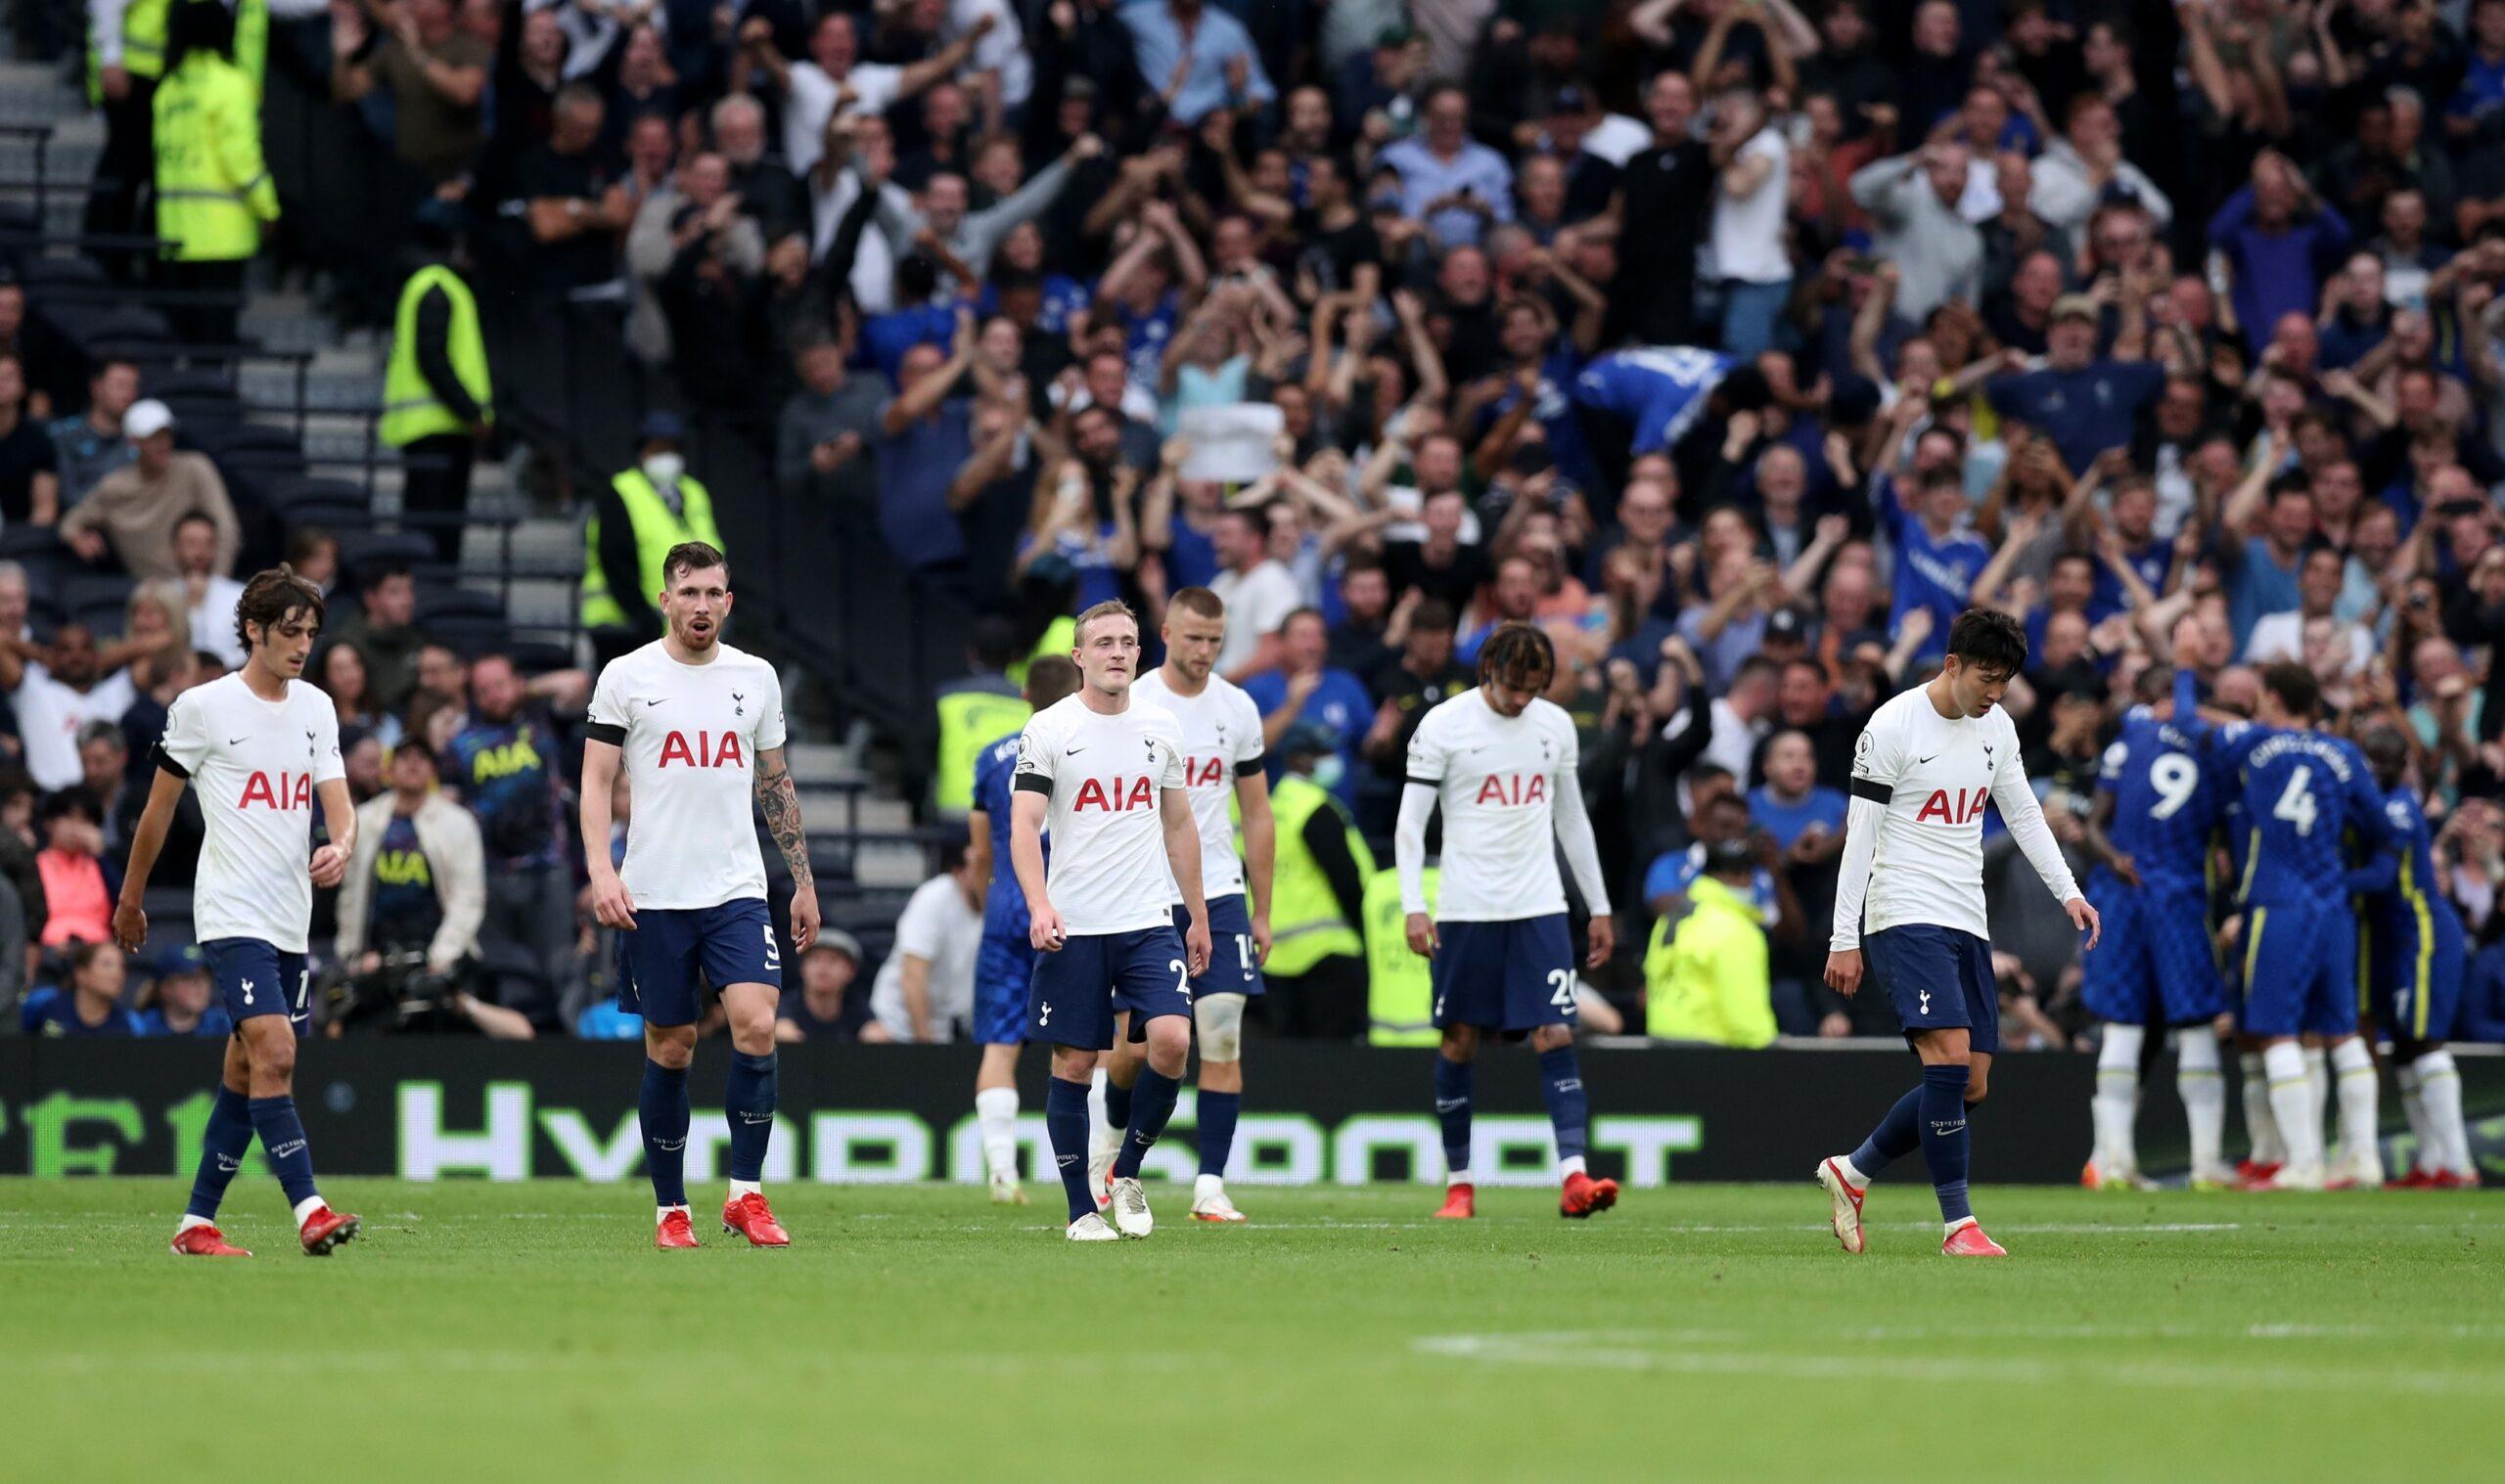 Lionel Messi struggling to settle at PSG, Tottenham vs Chelsea reaction,  Jack Wilshere Arsenal transfer LATEST - 247 News Around The World